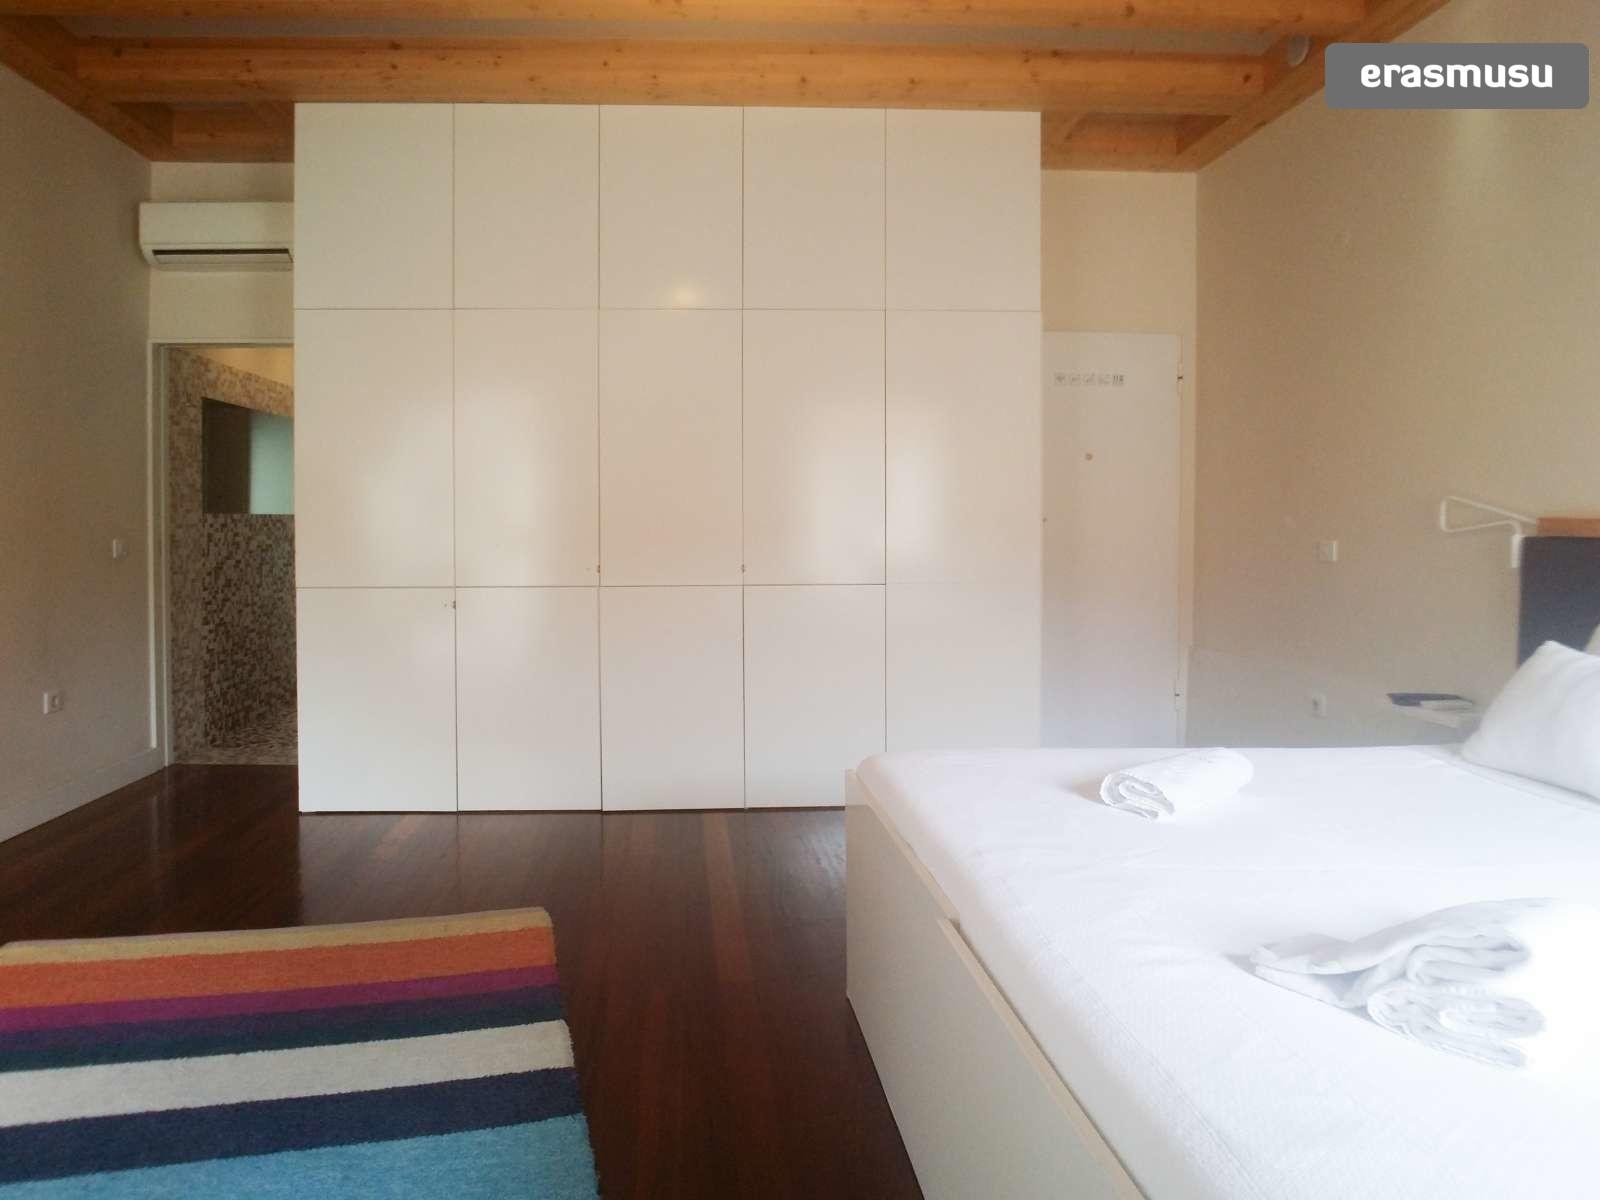 furnished-studio-apartment-rent-sao-nicolau-73334808697fc7b29f9b